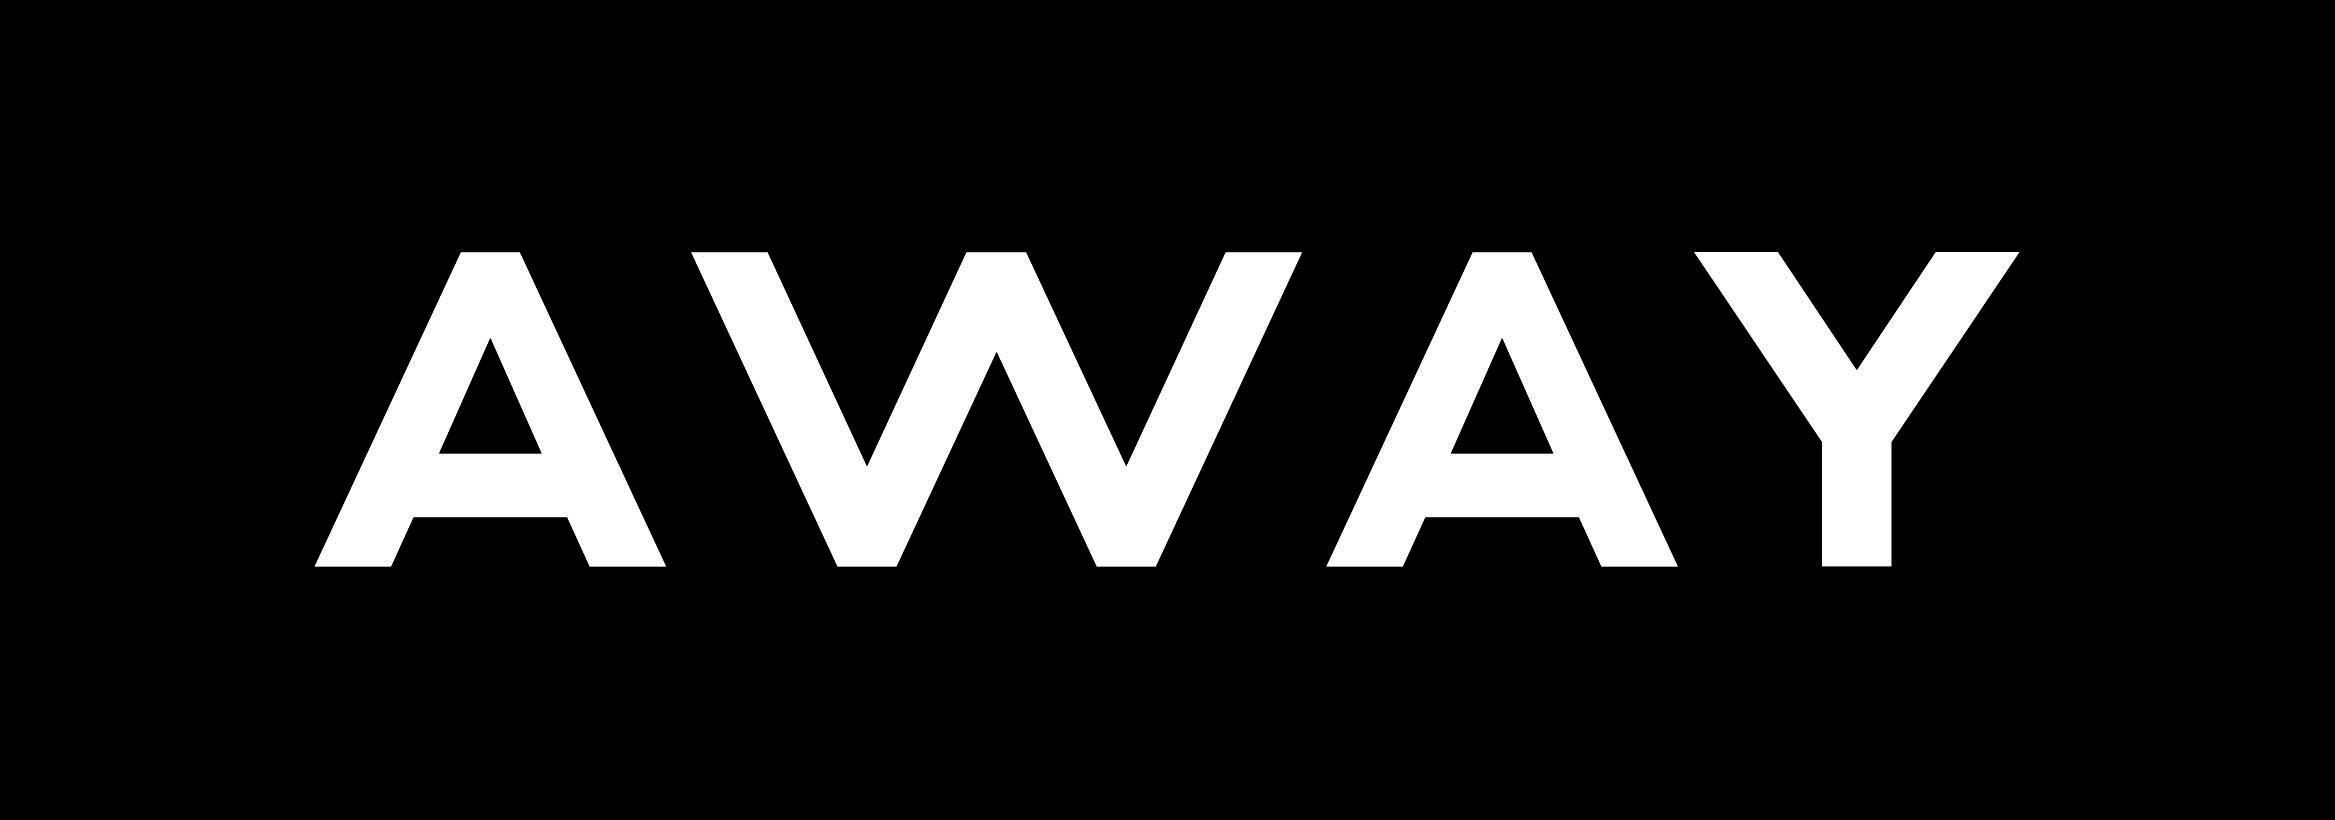 away-logo-highres.jpg